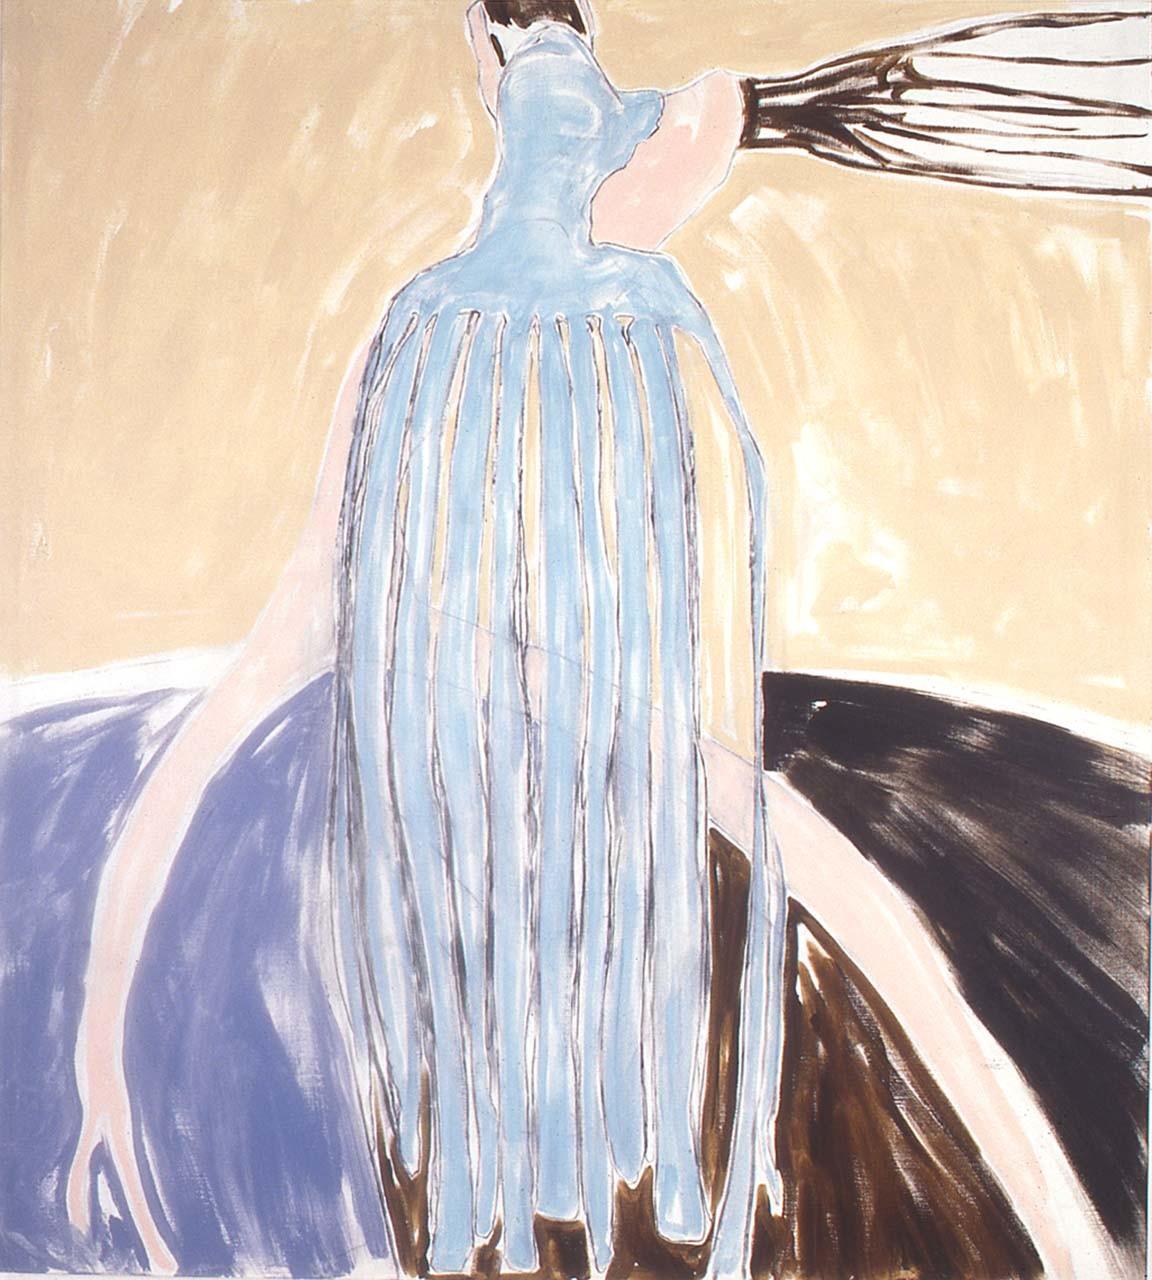 "<div class=""artwork_caption""><p>Curtain Figure, 1999</p></div>"